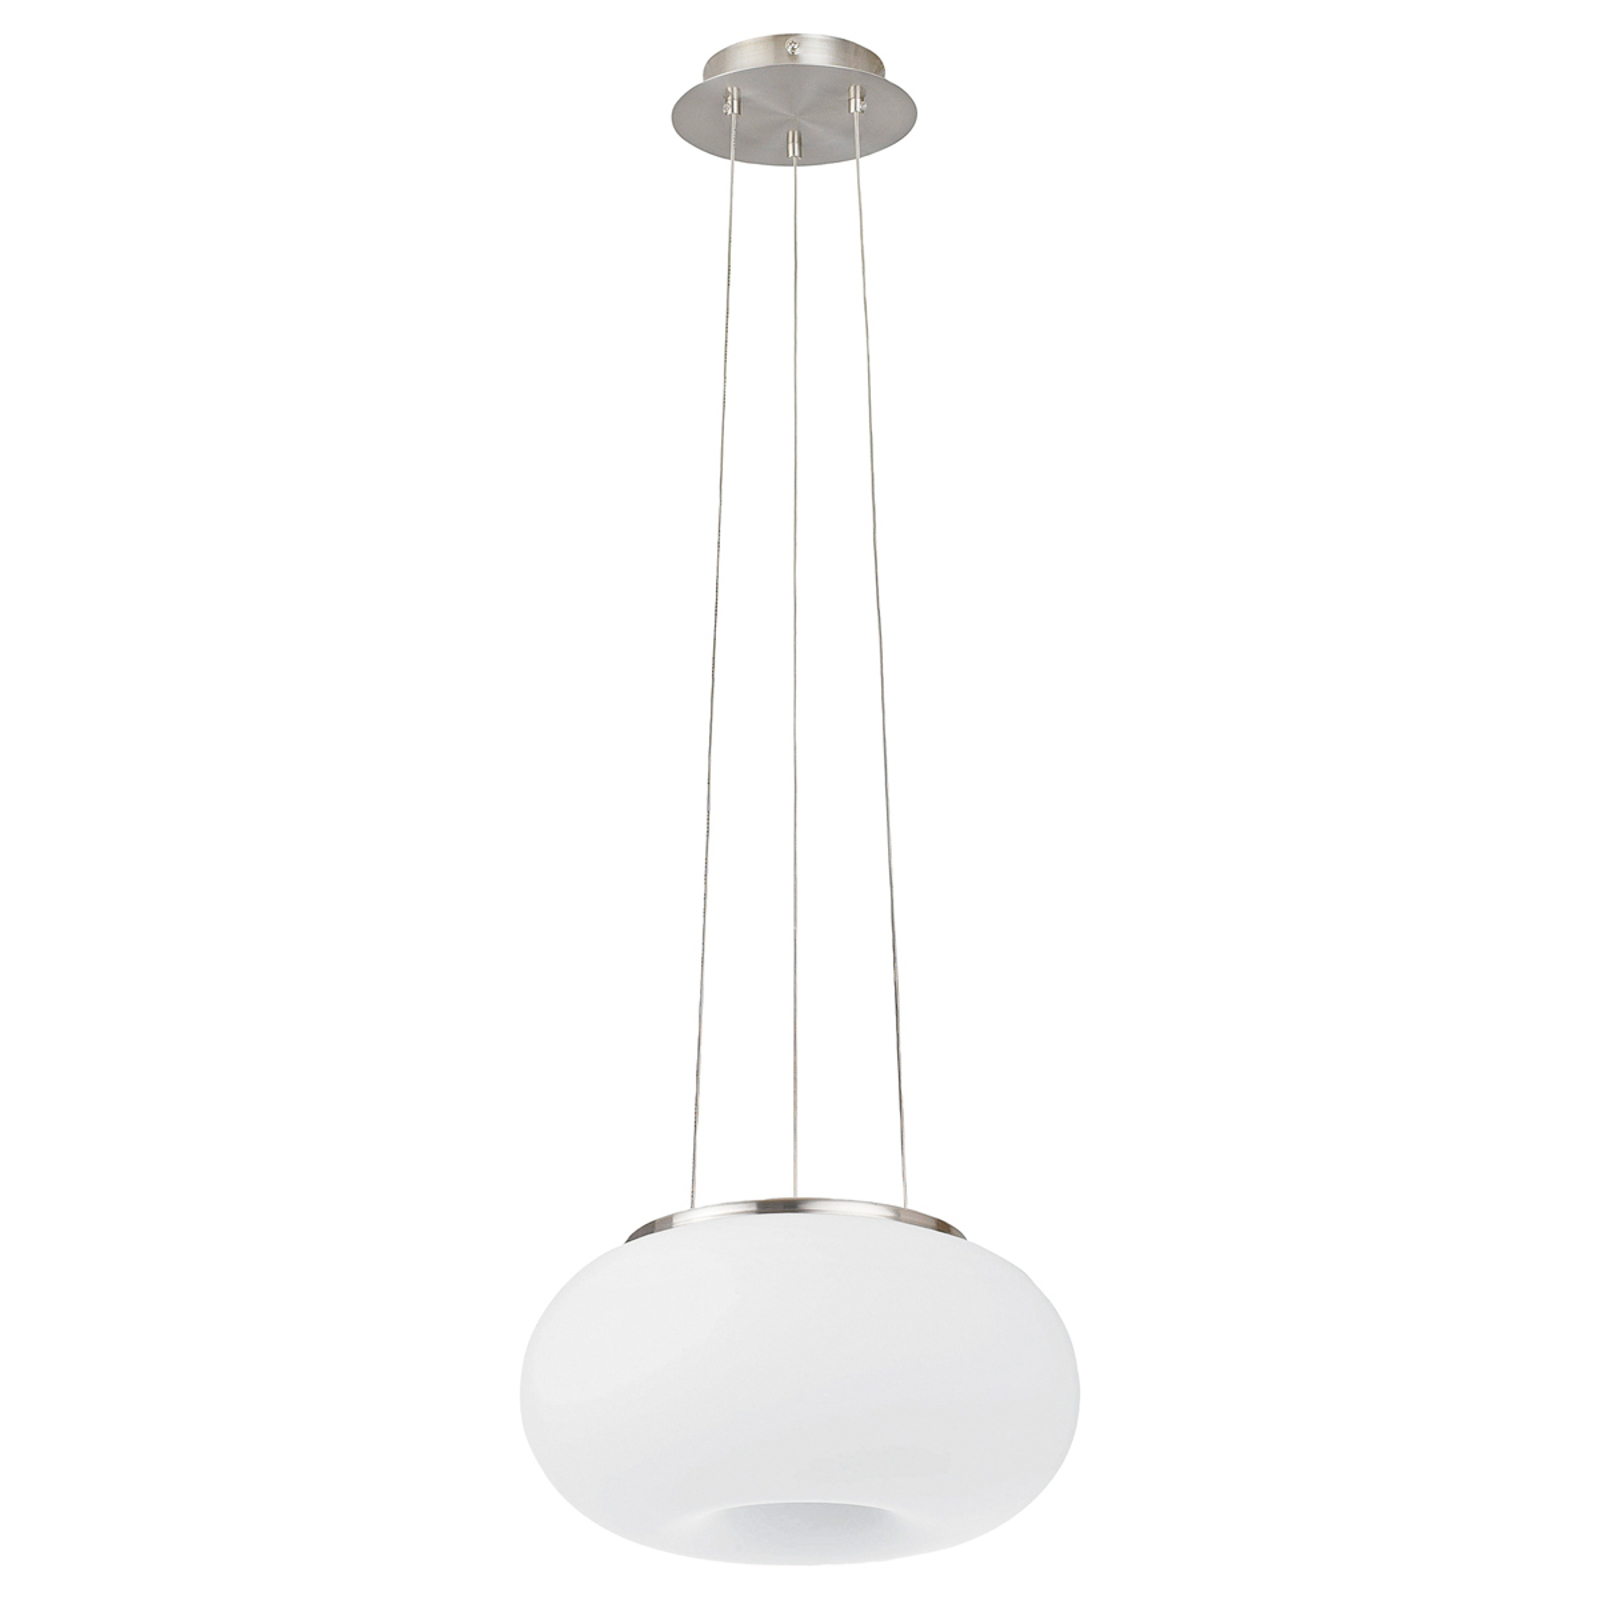 Moderná závesná lampa Optica 35 cm